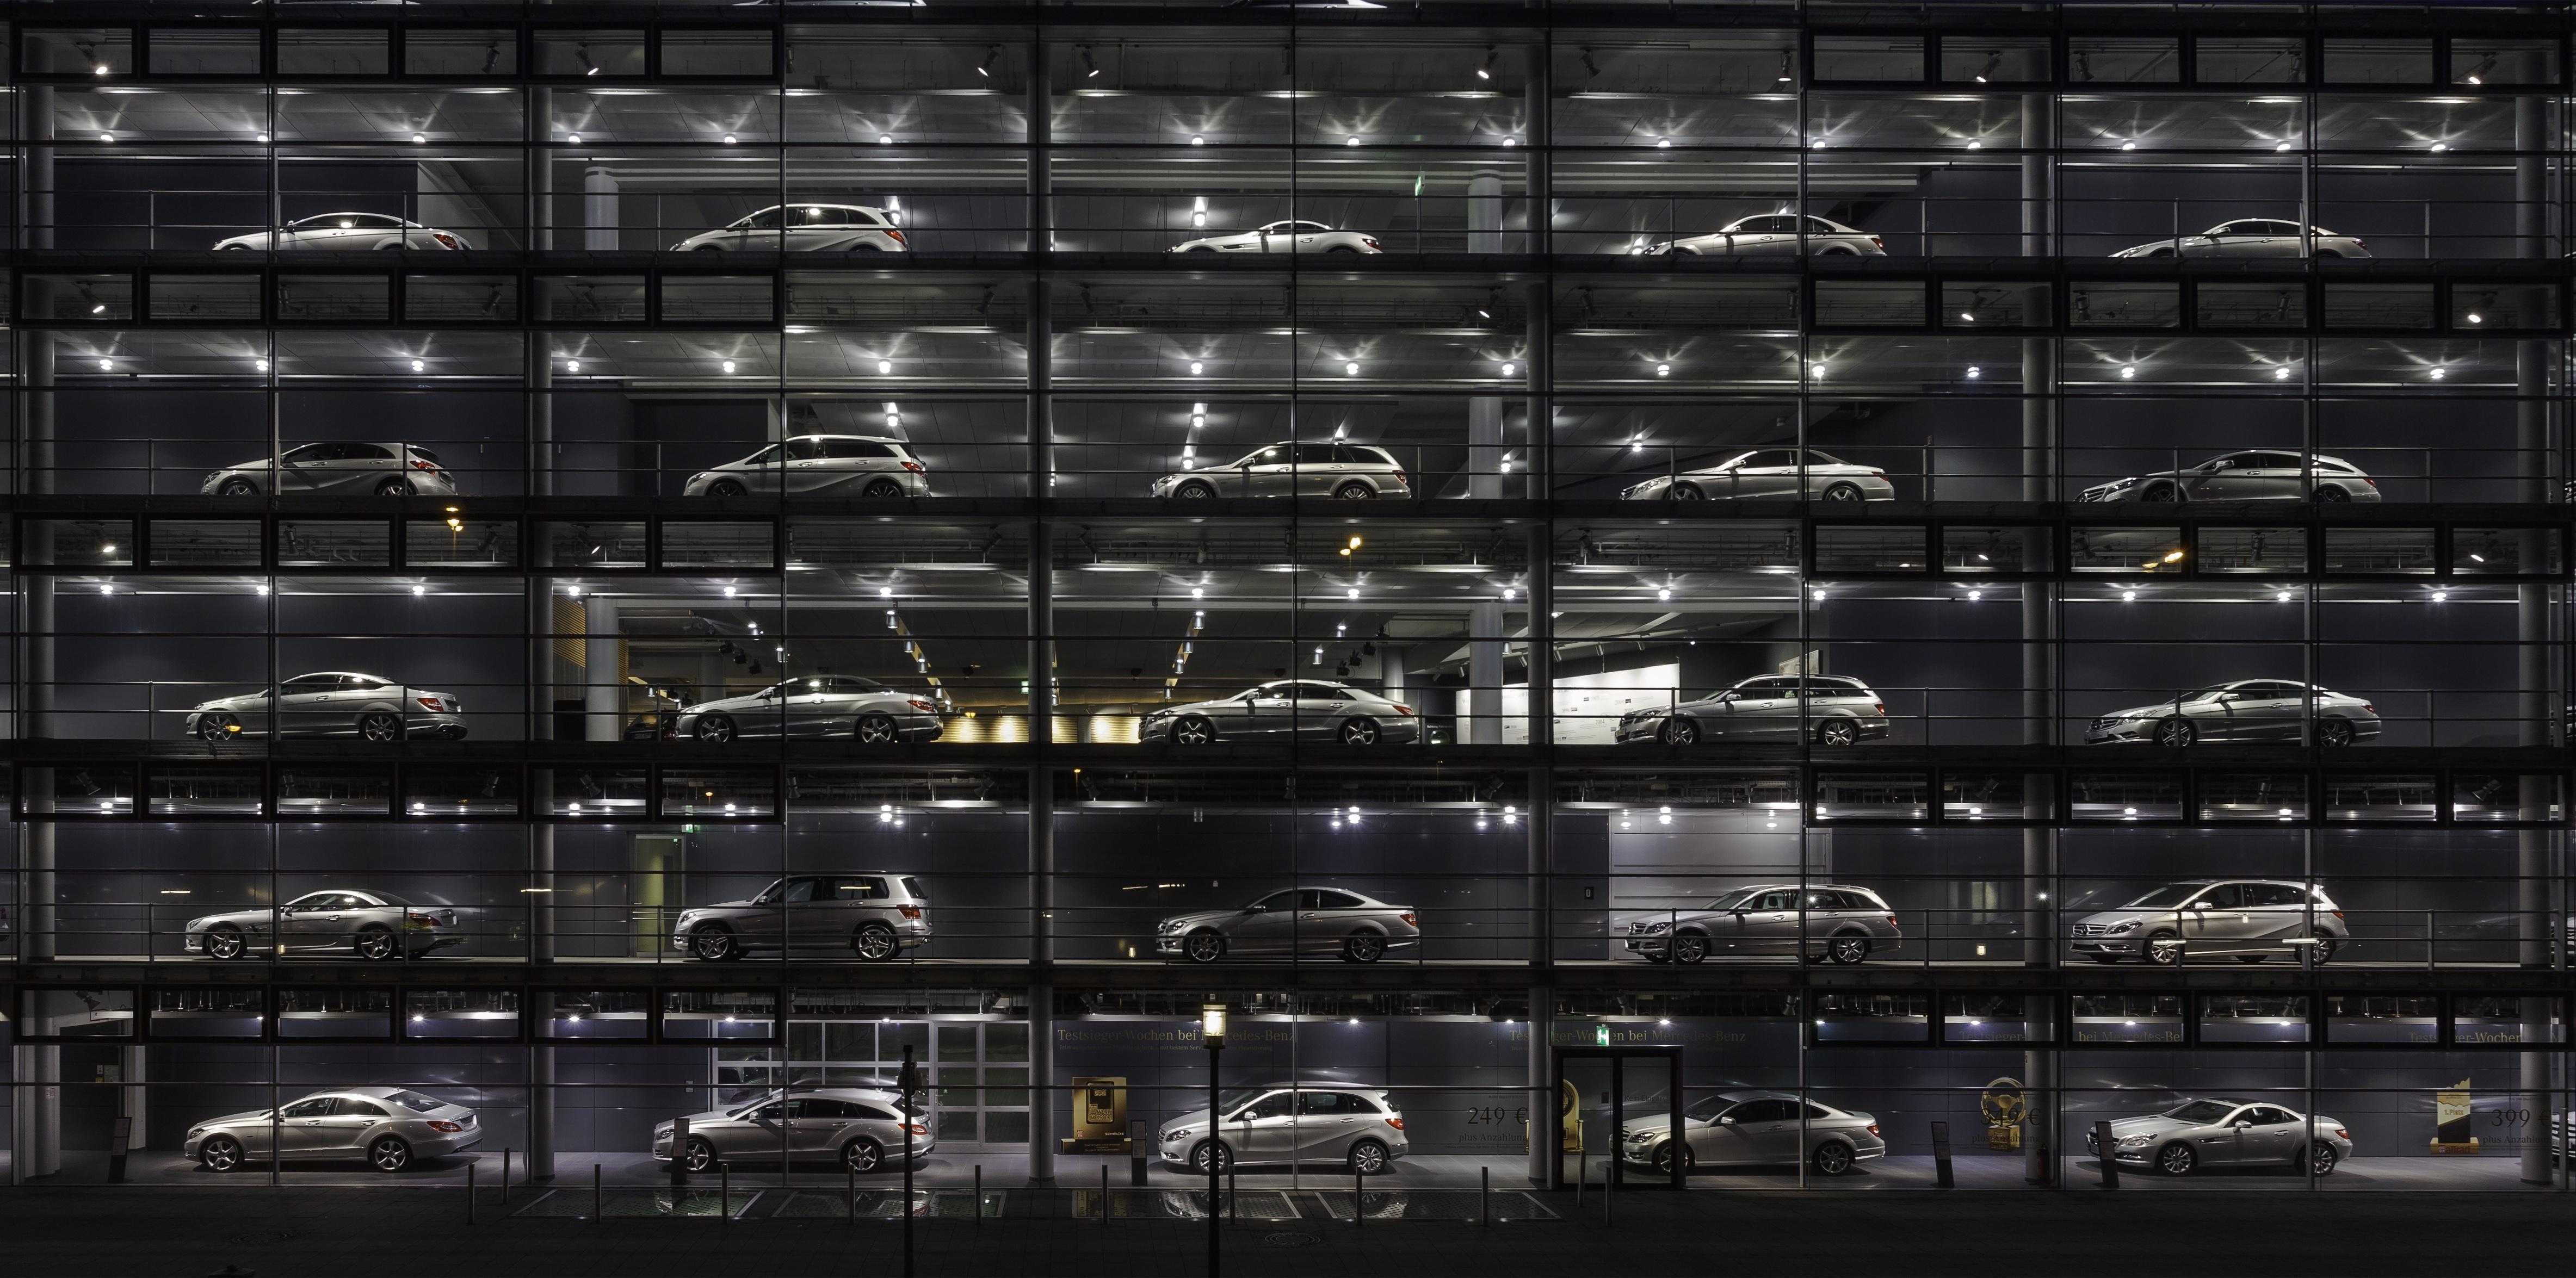 dealership showroom of the car-maker mercedes-benz in munich